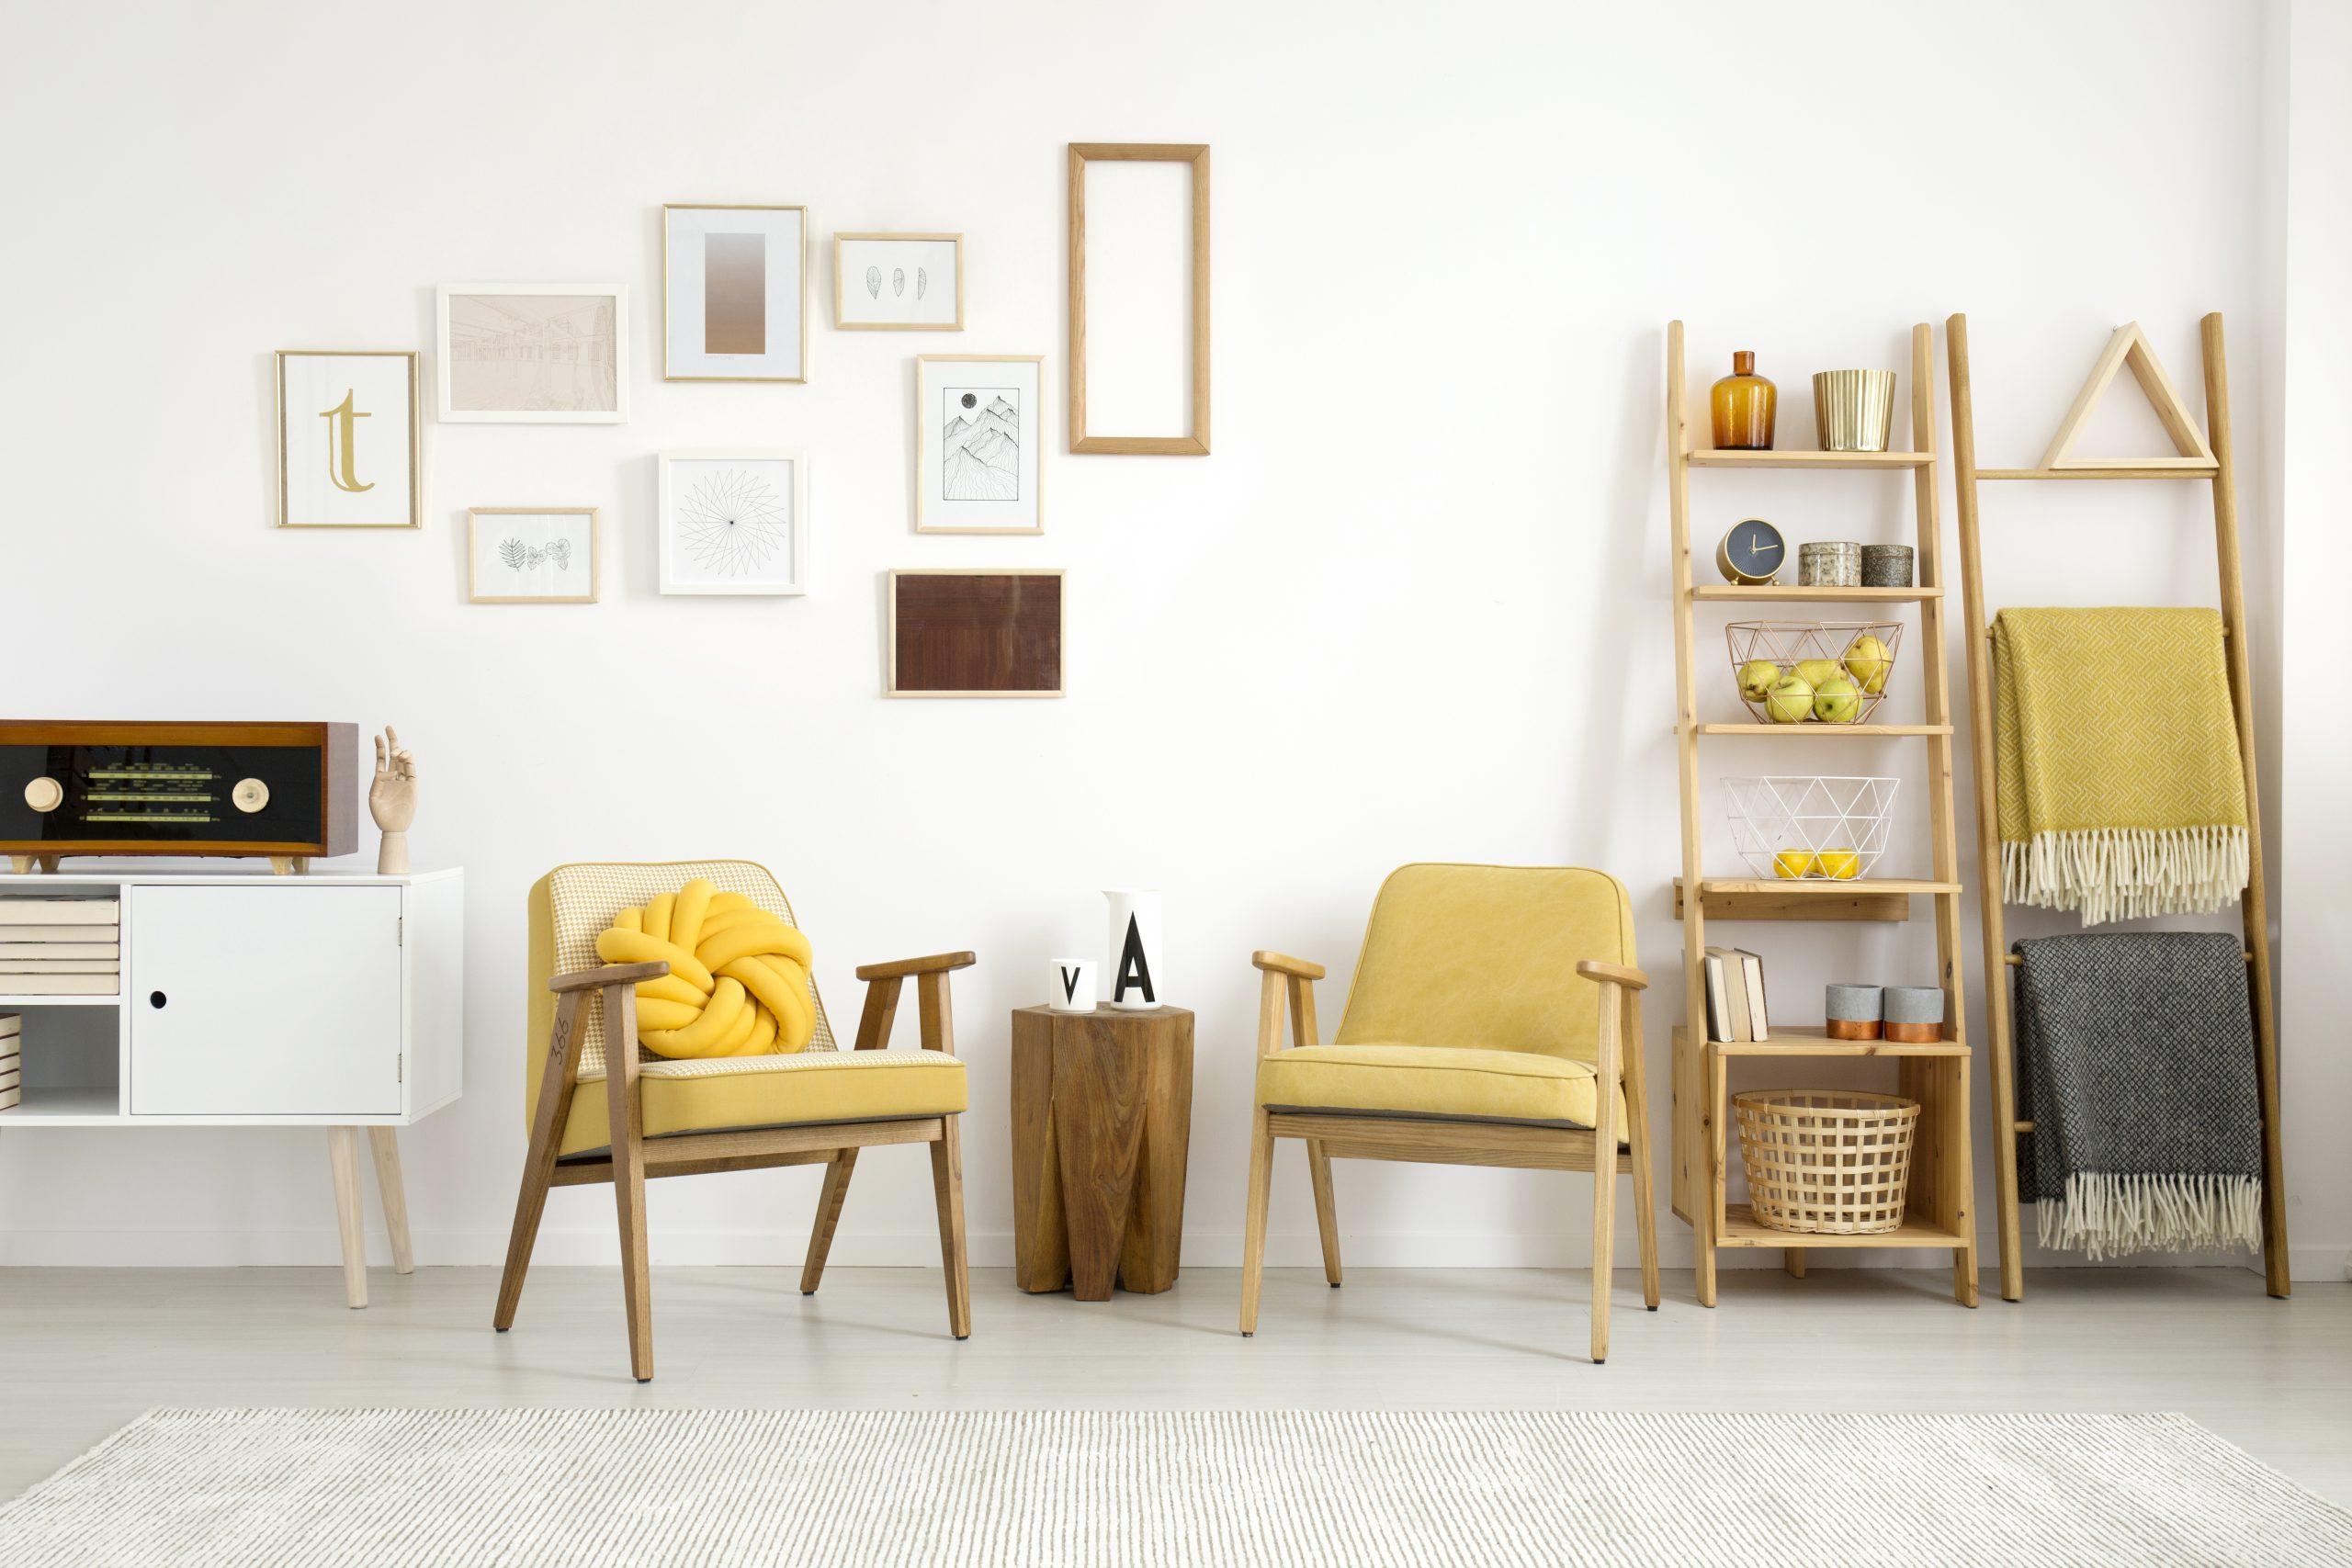 Framefox gallery wall Yellow living room interior